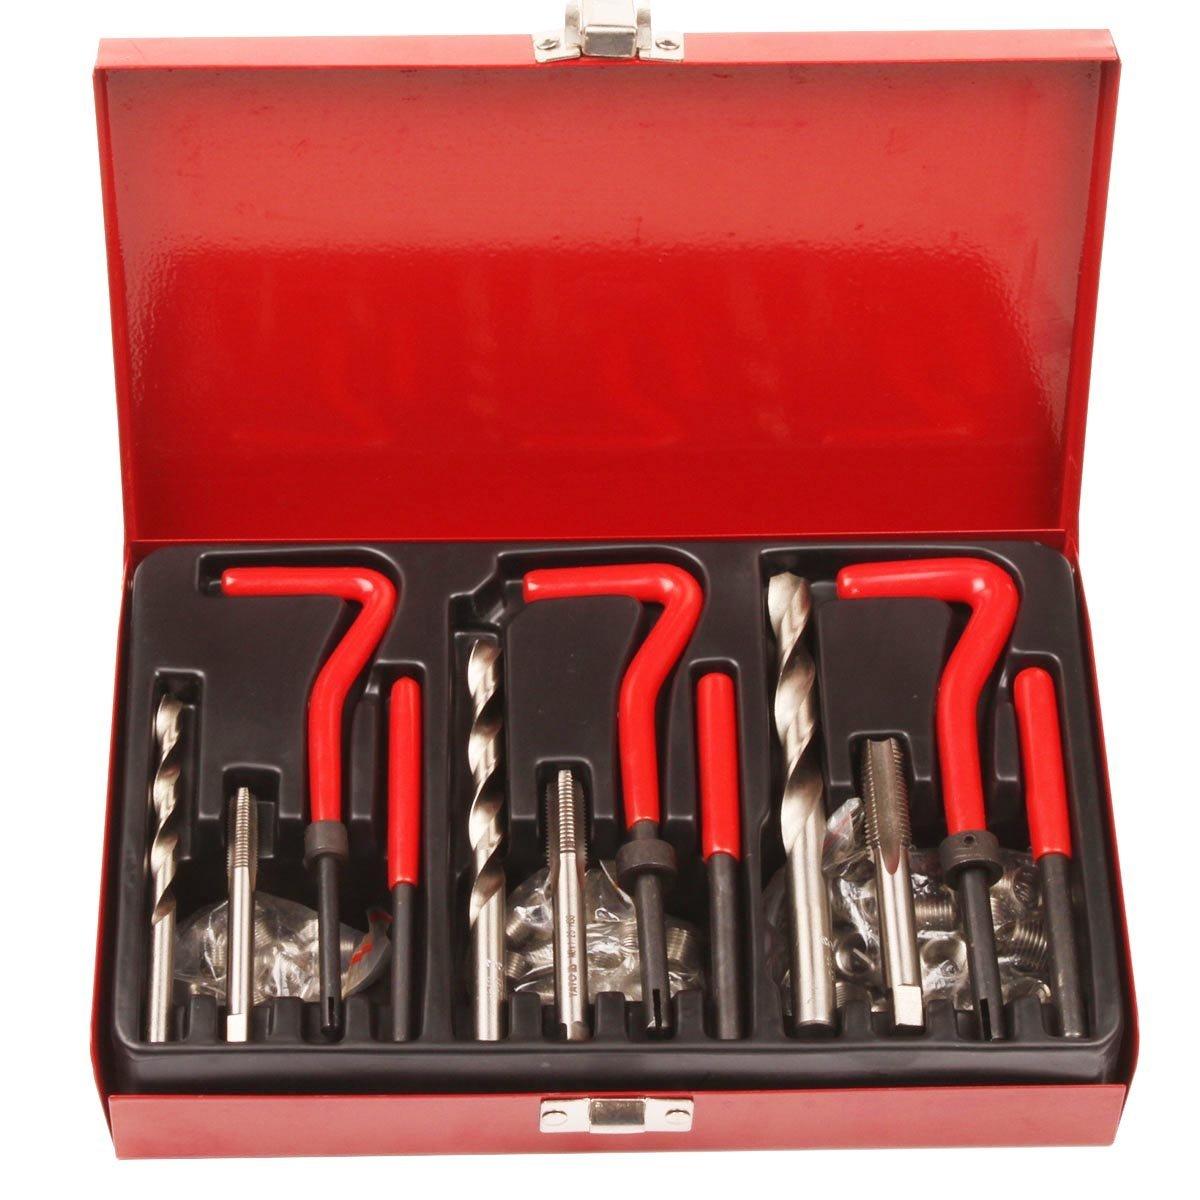 Qbace 88pc Thread Repair Kit Set Rethread M6 M8 M10 Damaged Threads Garage Tool